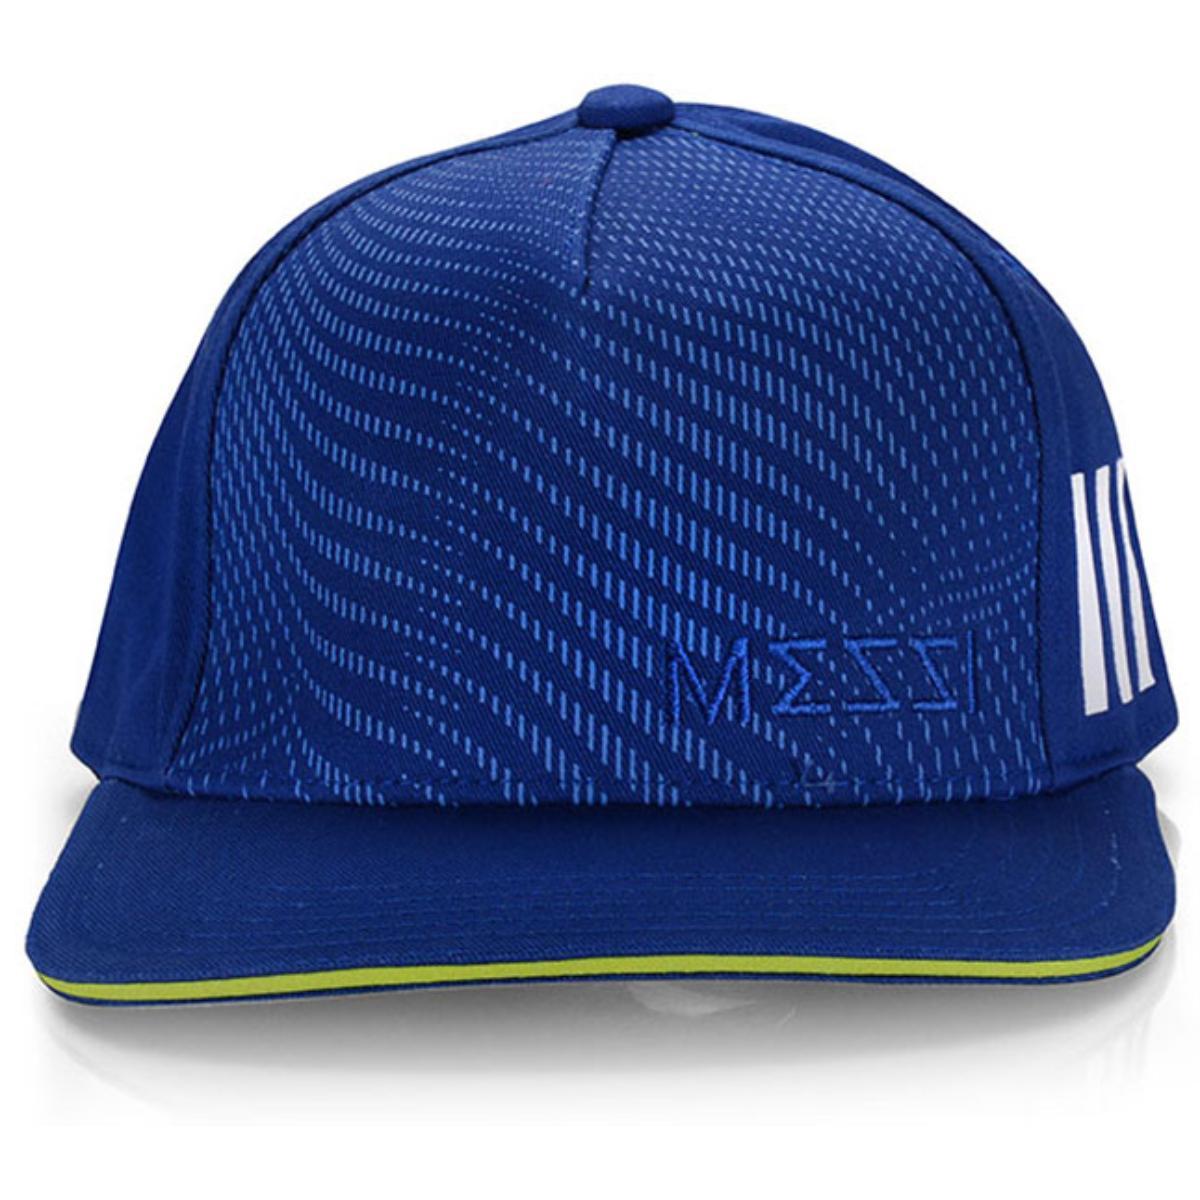 Boné Masculino Adidas Ec2478 Messi Kids ya Azul/limão